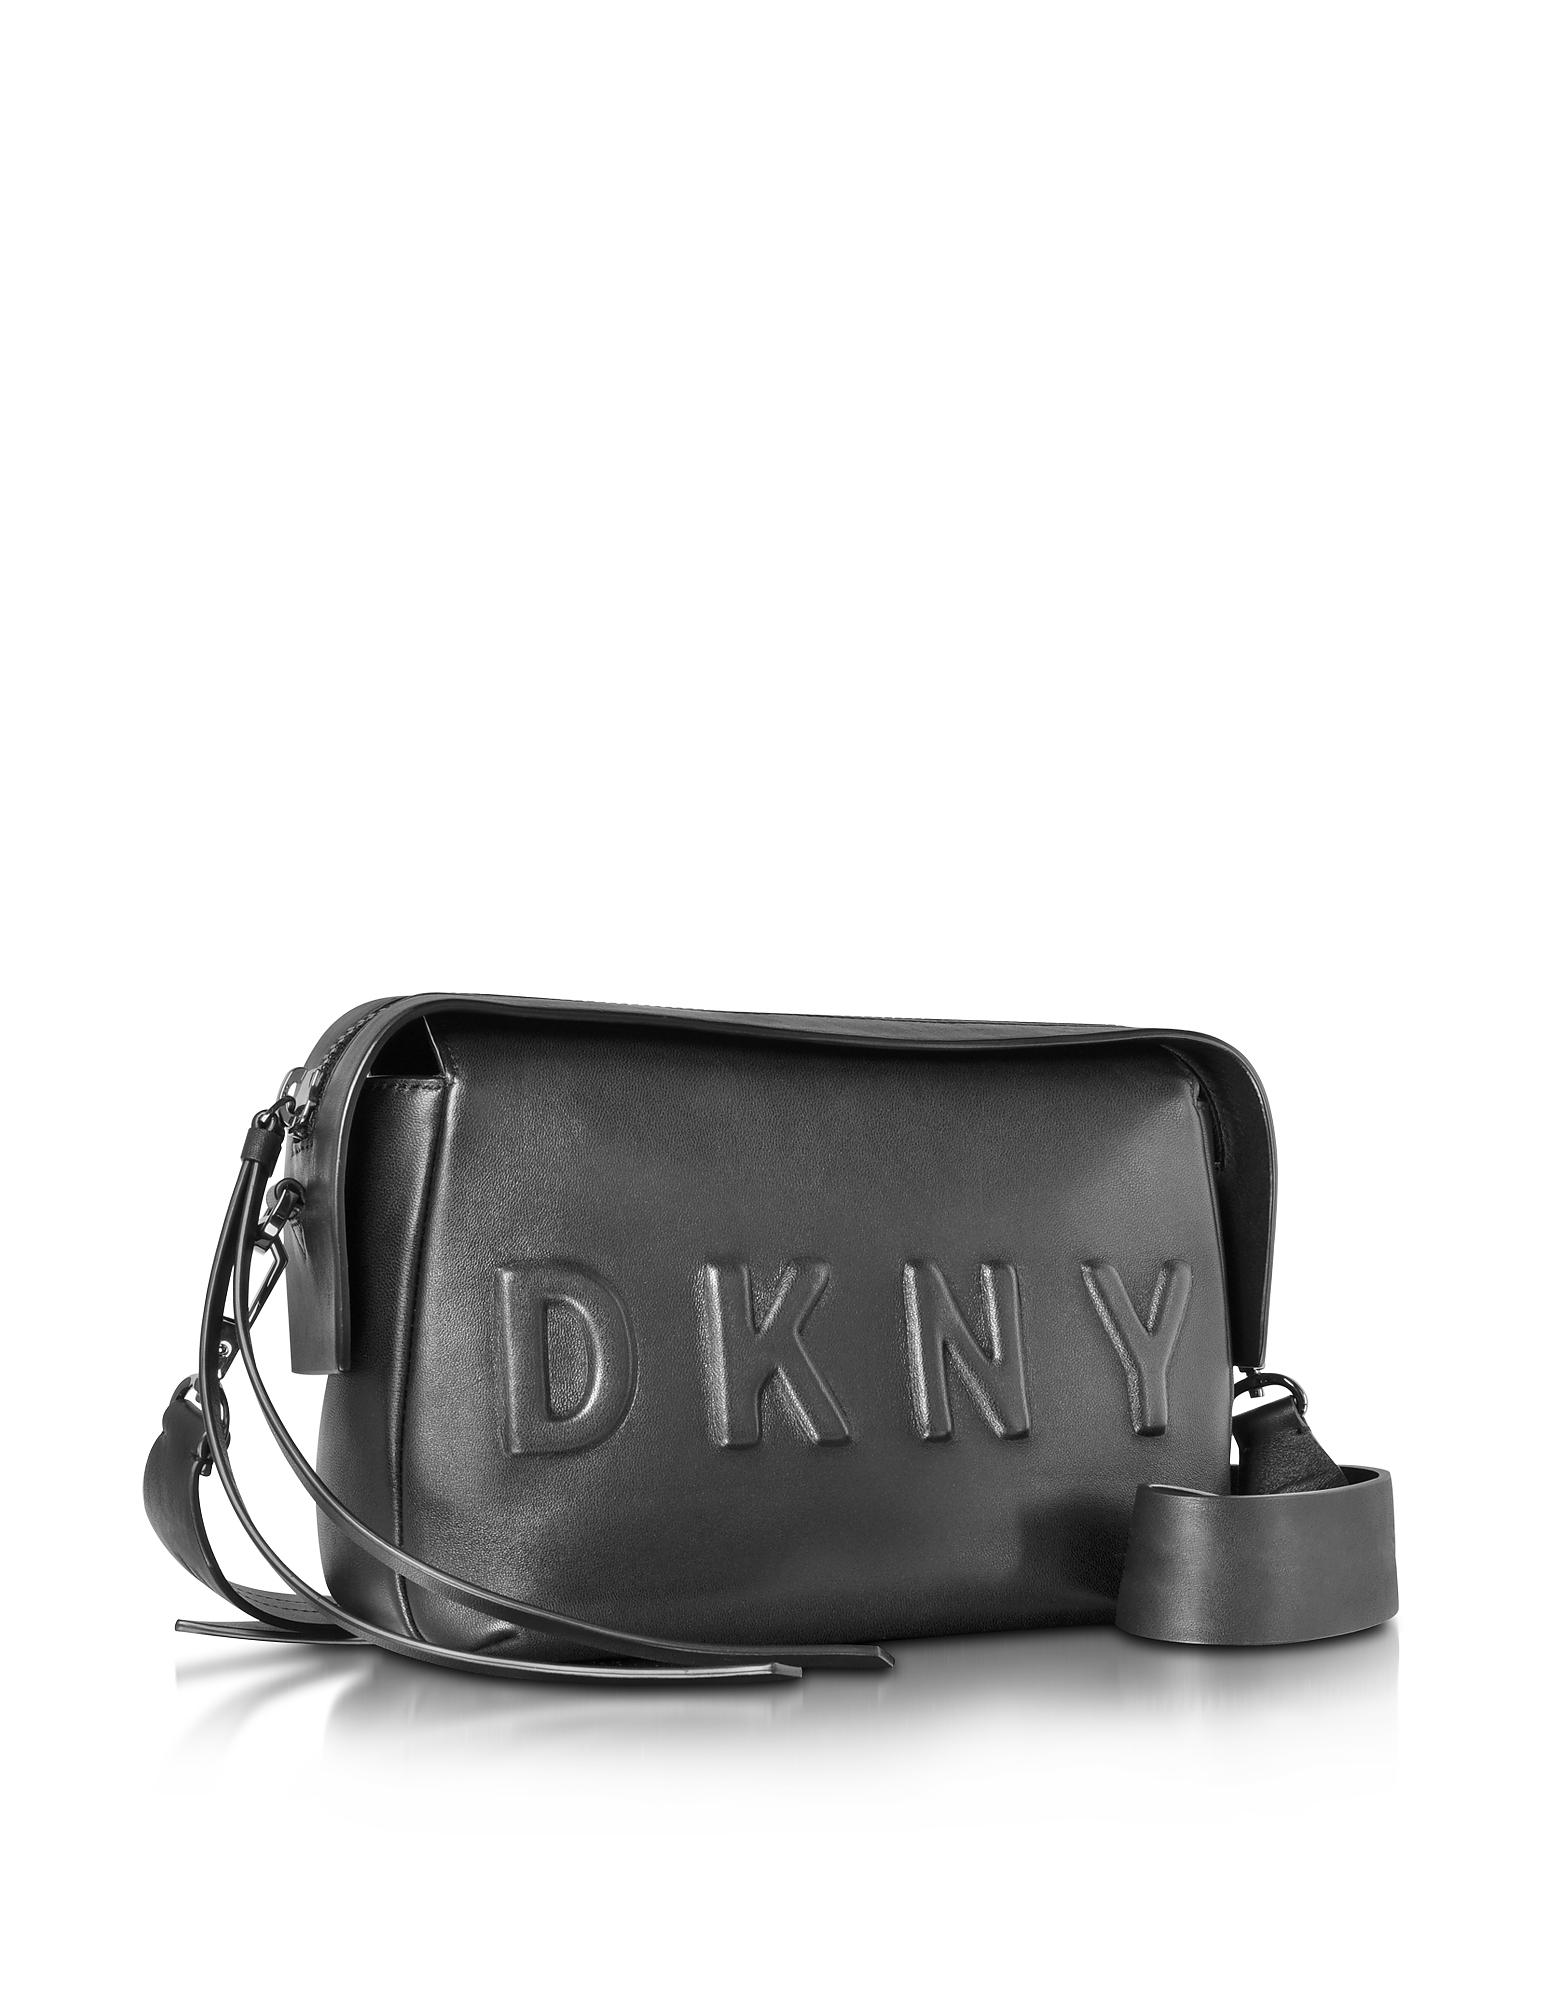 Lyst - DKNY Debossed Logo Black black Leather Crossbody Bag in Black 6b5e78a485023